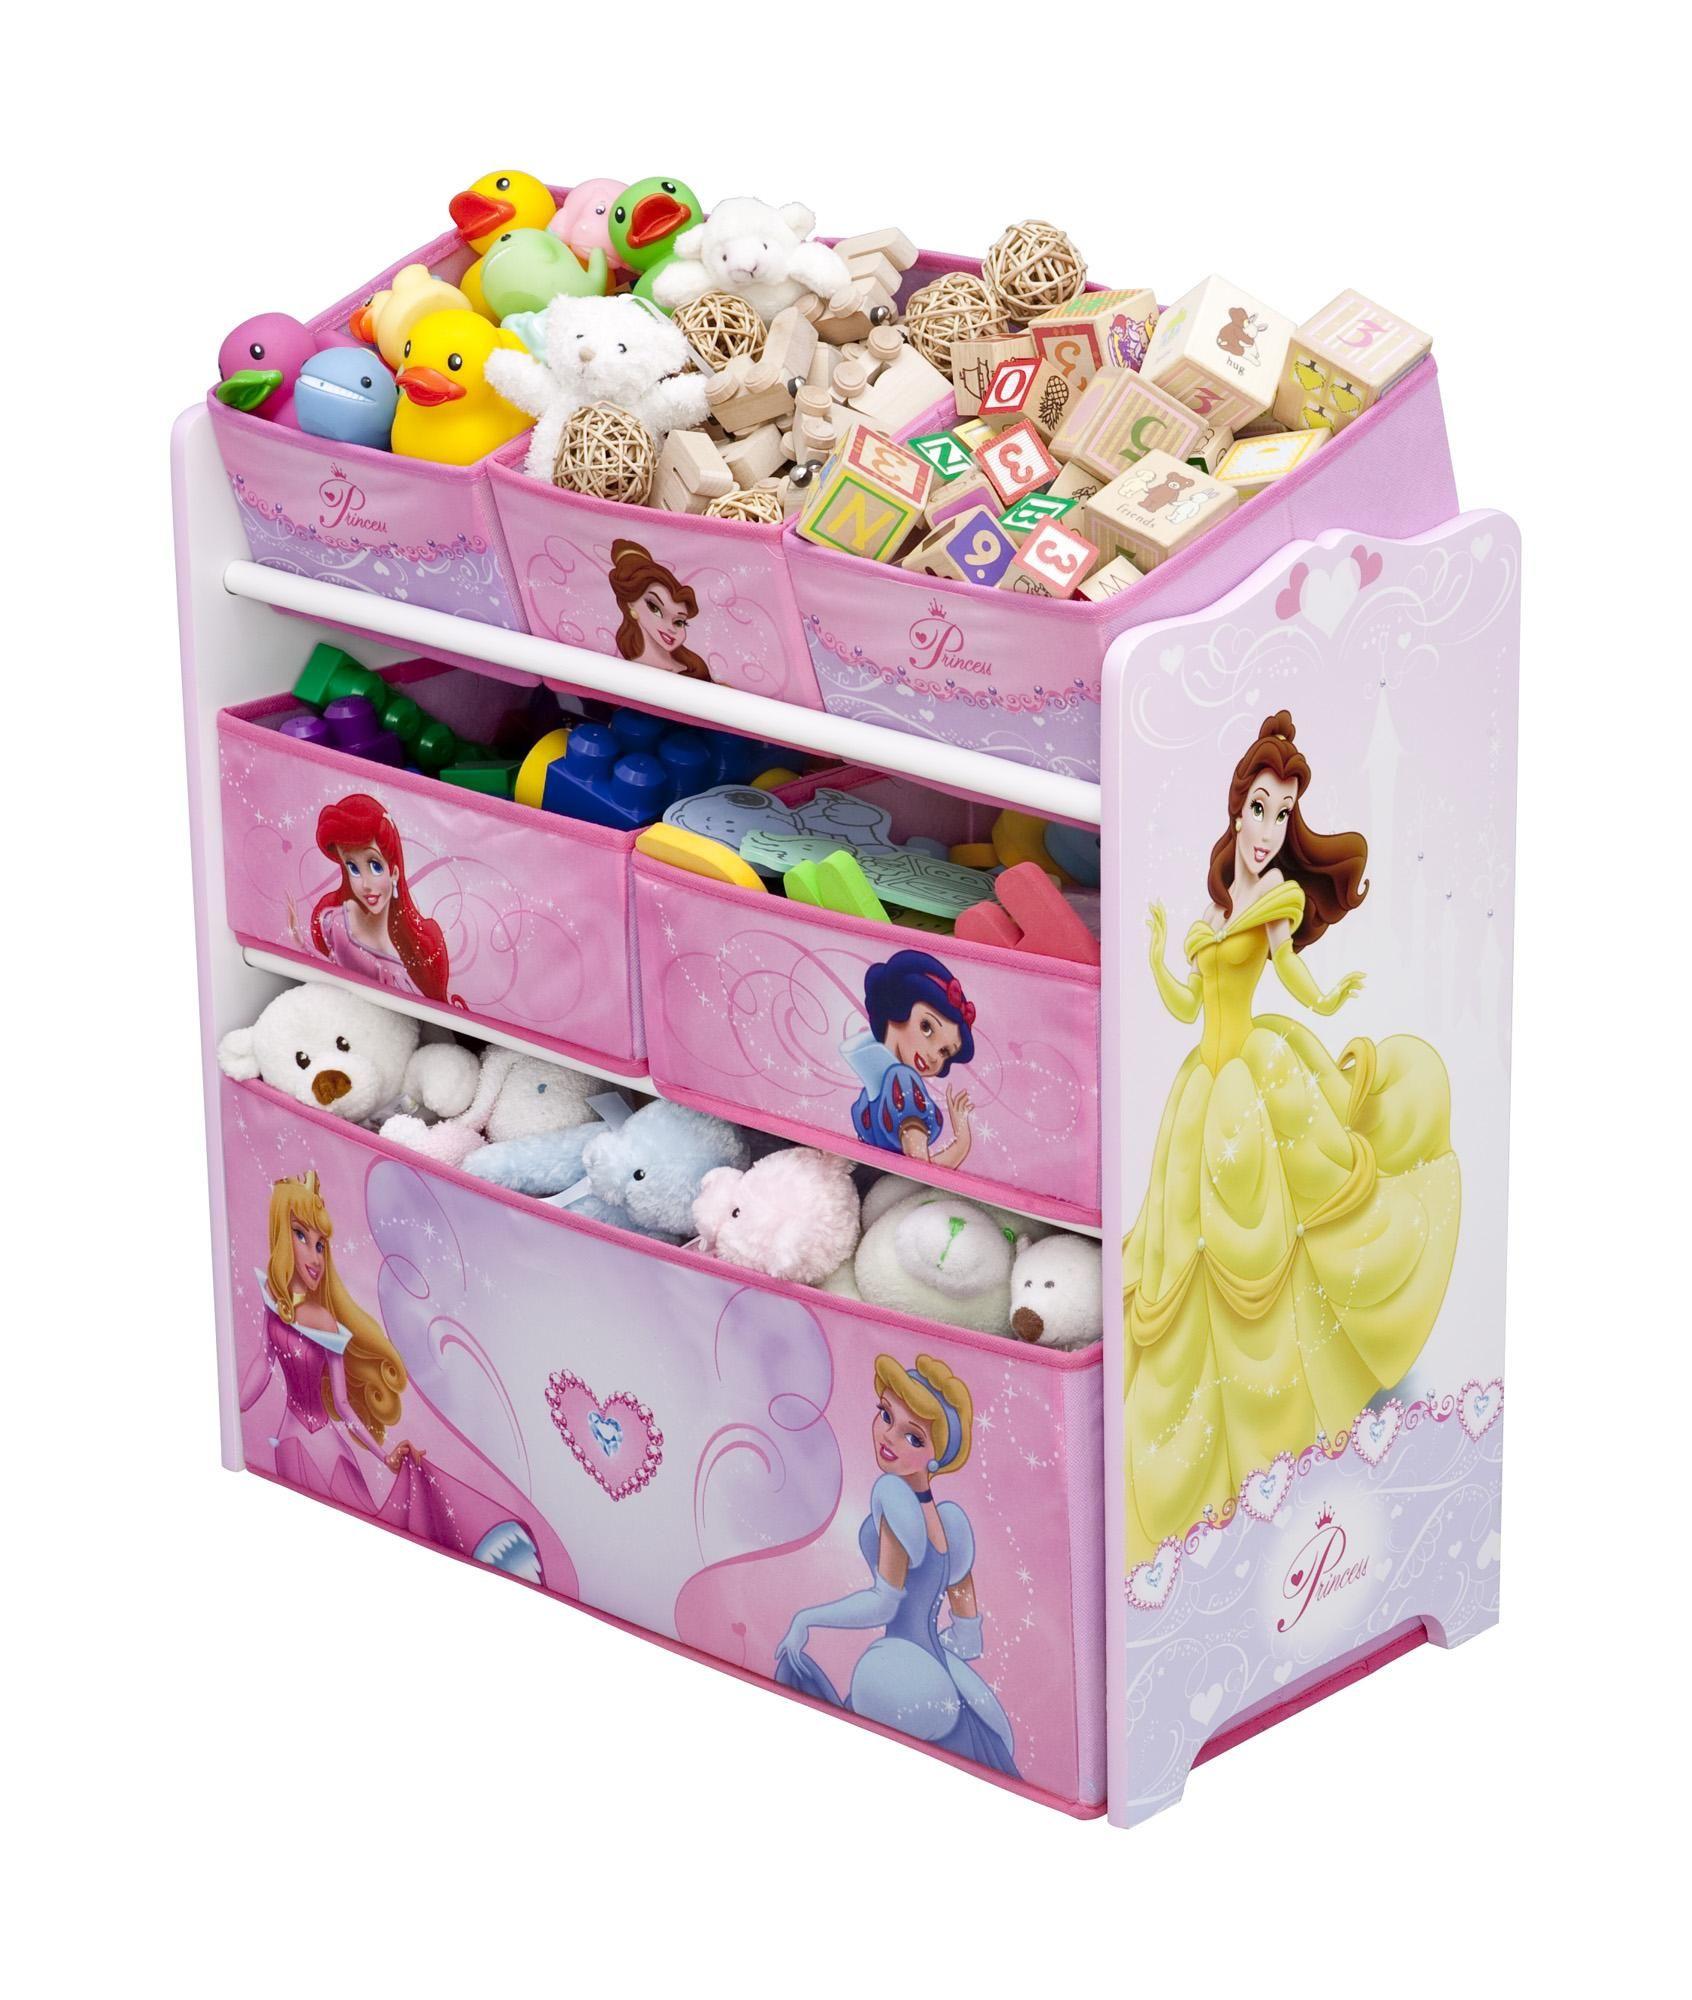 Disney Princess Multi Bin Toy Organizer Toy Organization